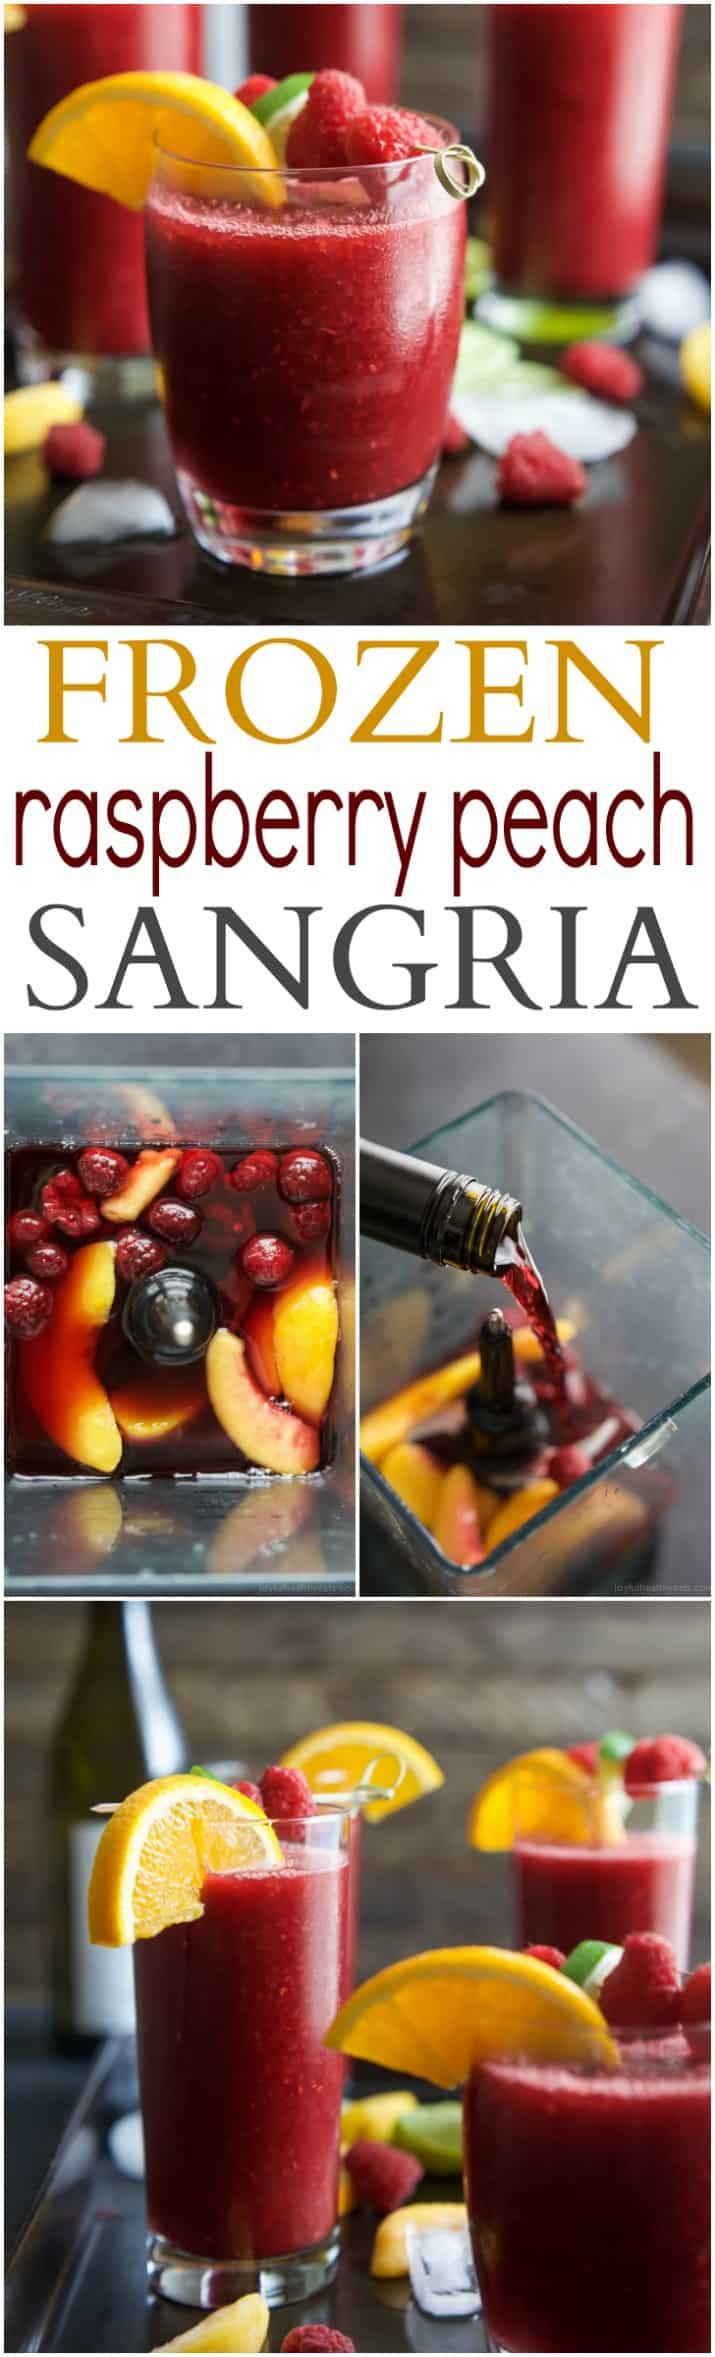 Frozen Raspberry Peach Sangria recipe collage